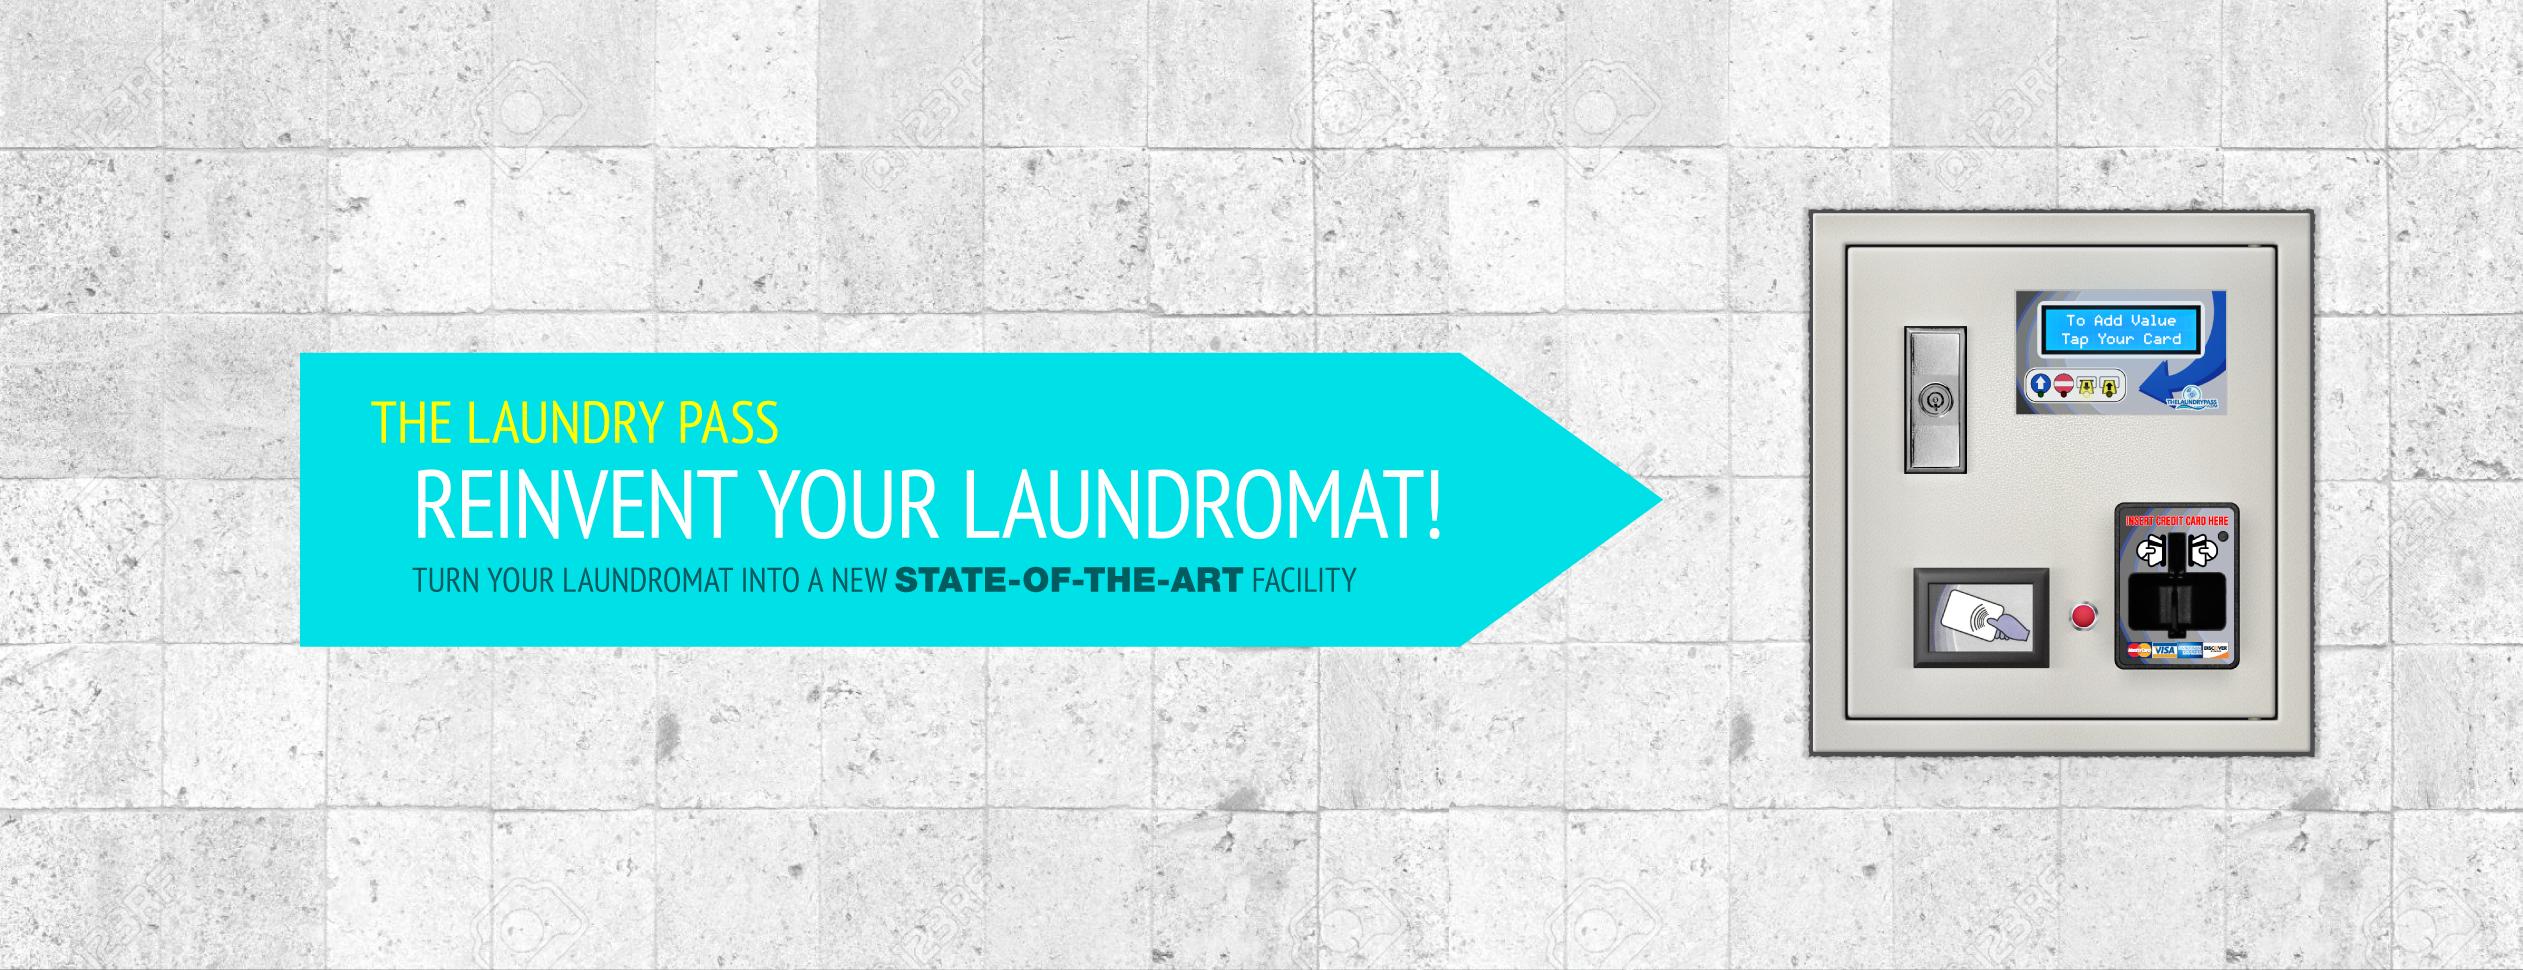 Reinvent-Laundromat-01